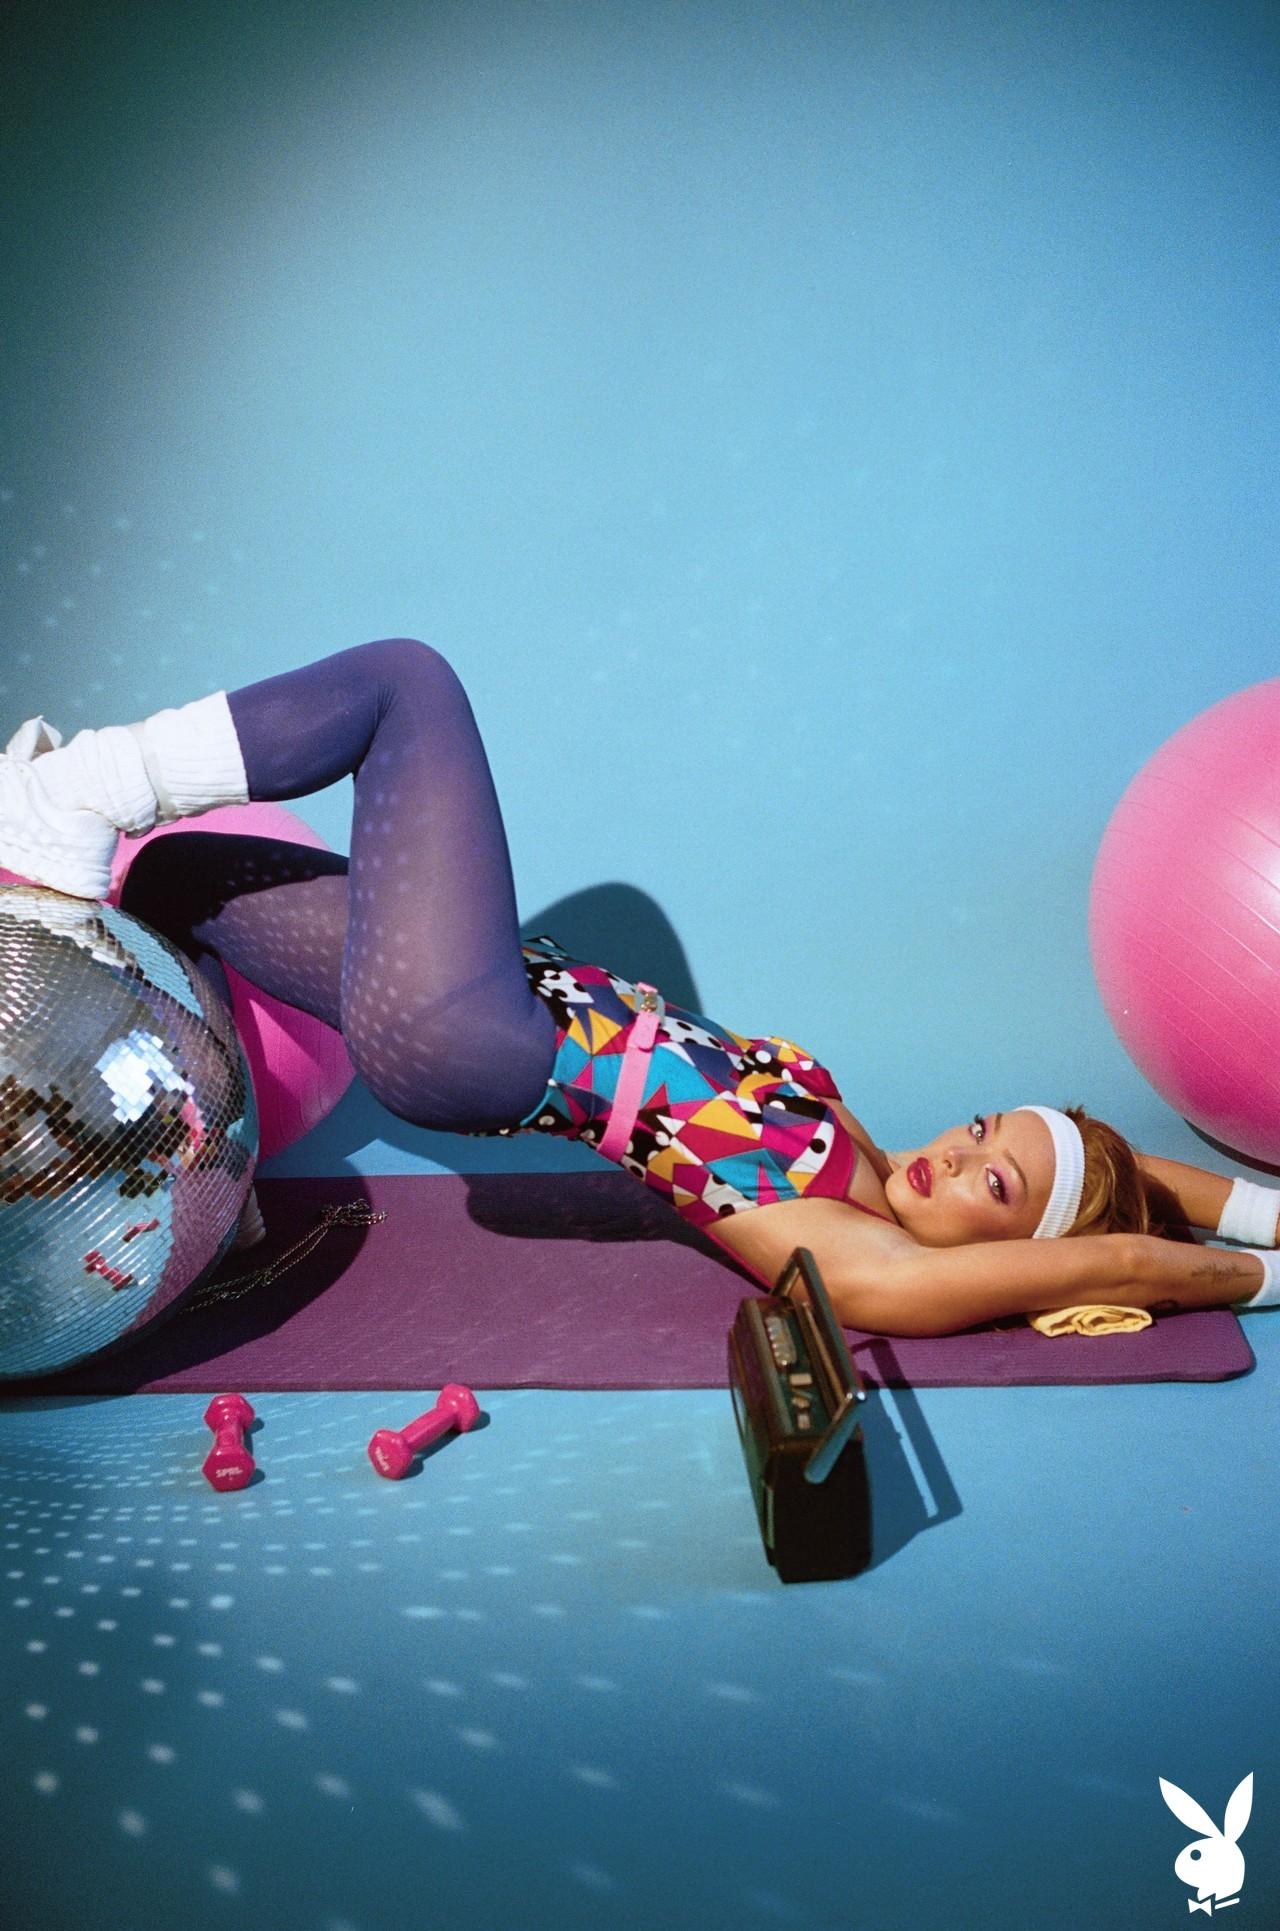 Aubrey Destremps In Let's Get Physical (6)